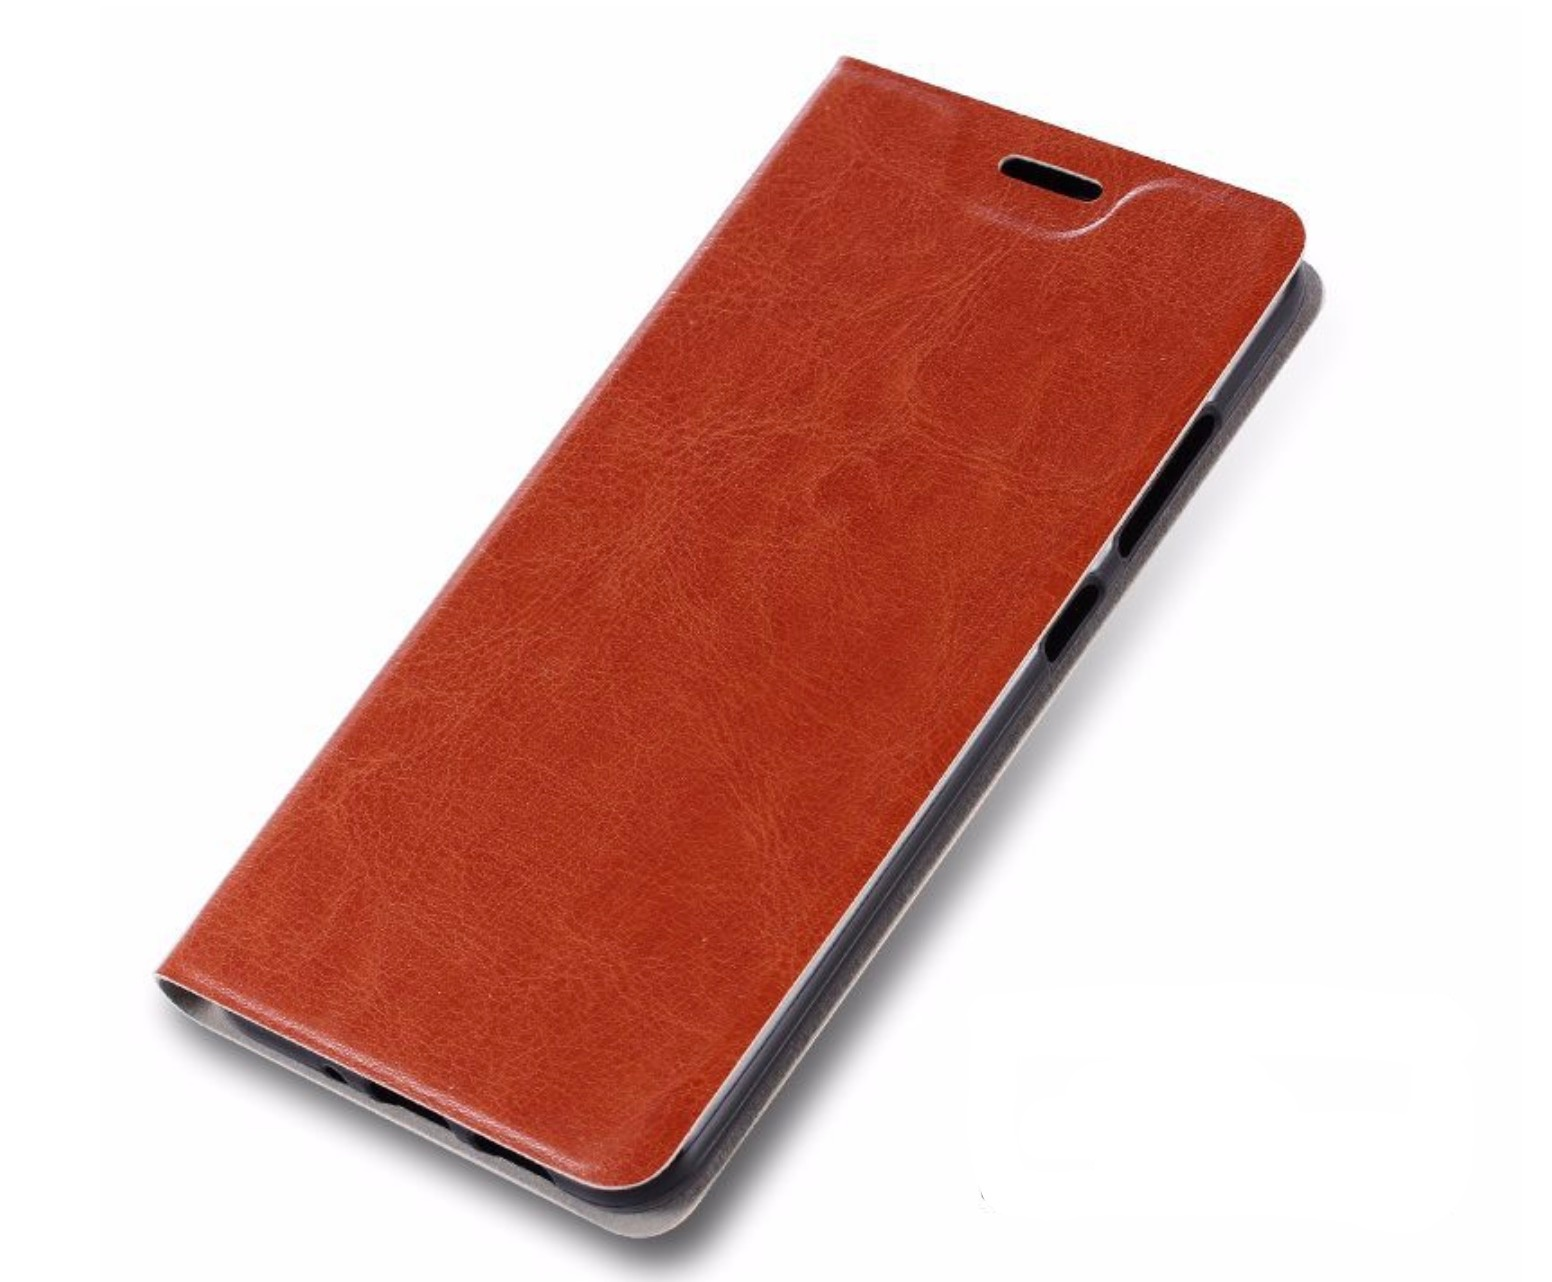 Фото - Чехол-книжка MyPads для ZTE Nubia Z11 mini S 5.2 на жёсткой металлической основе коричневый zte nubia z11 mini nx529j 5 0 fhd android 5 1 smartphone black